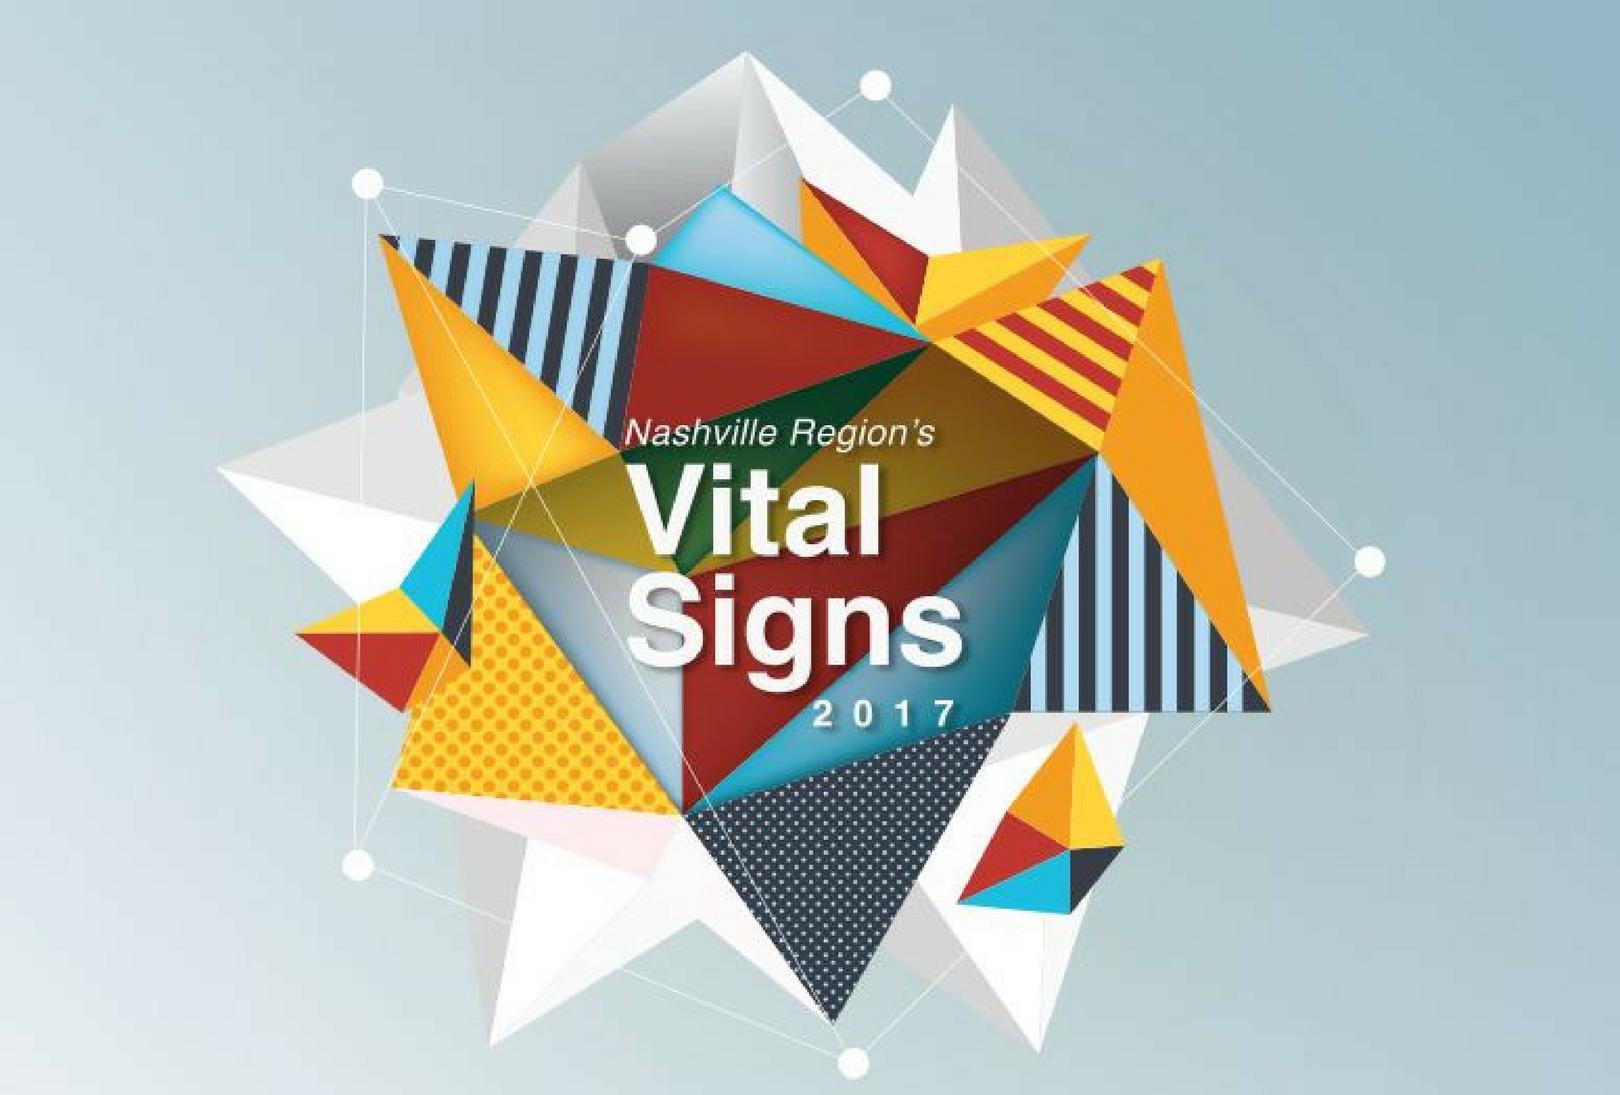 Nashville's Vital Signs 2017